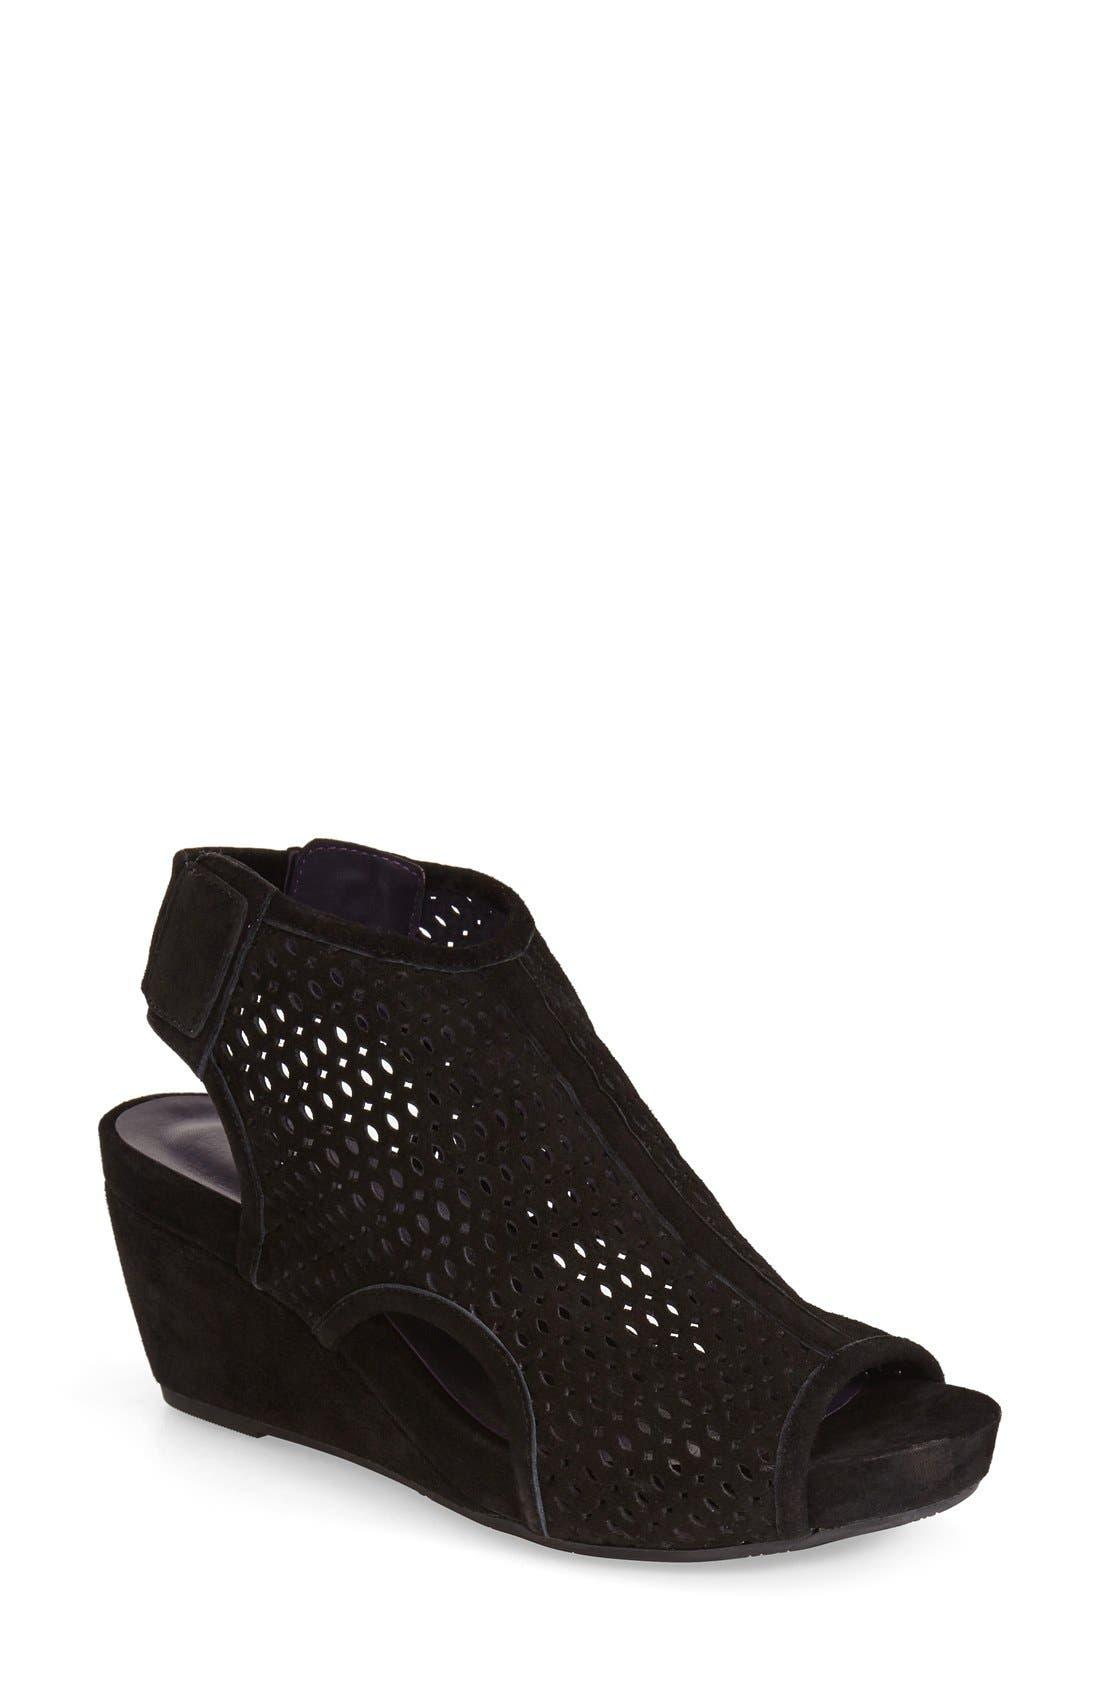 'Inez' Wedge Sandal,                         Main,                         color, 001